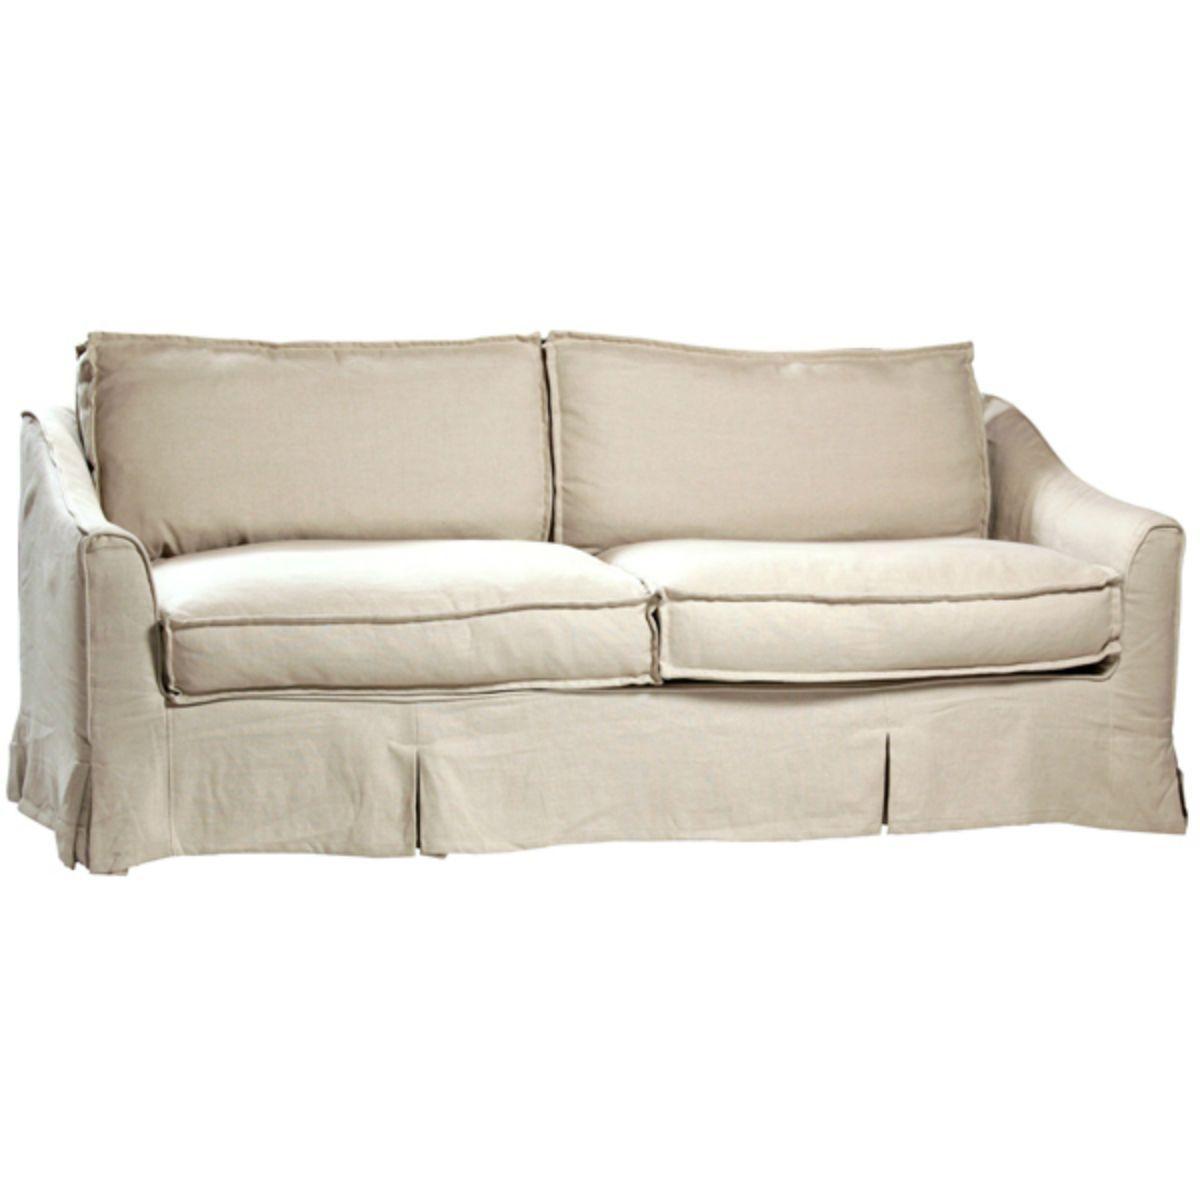 sofa null sectional of sofas loveseats pics fresh slipcovered amp inspirational dylan the slipcover down filled